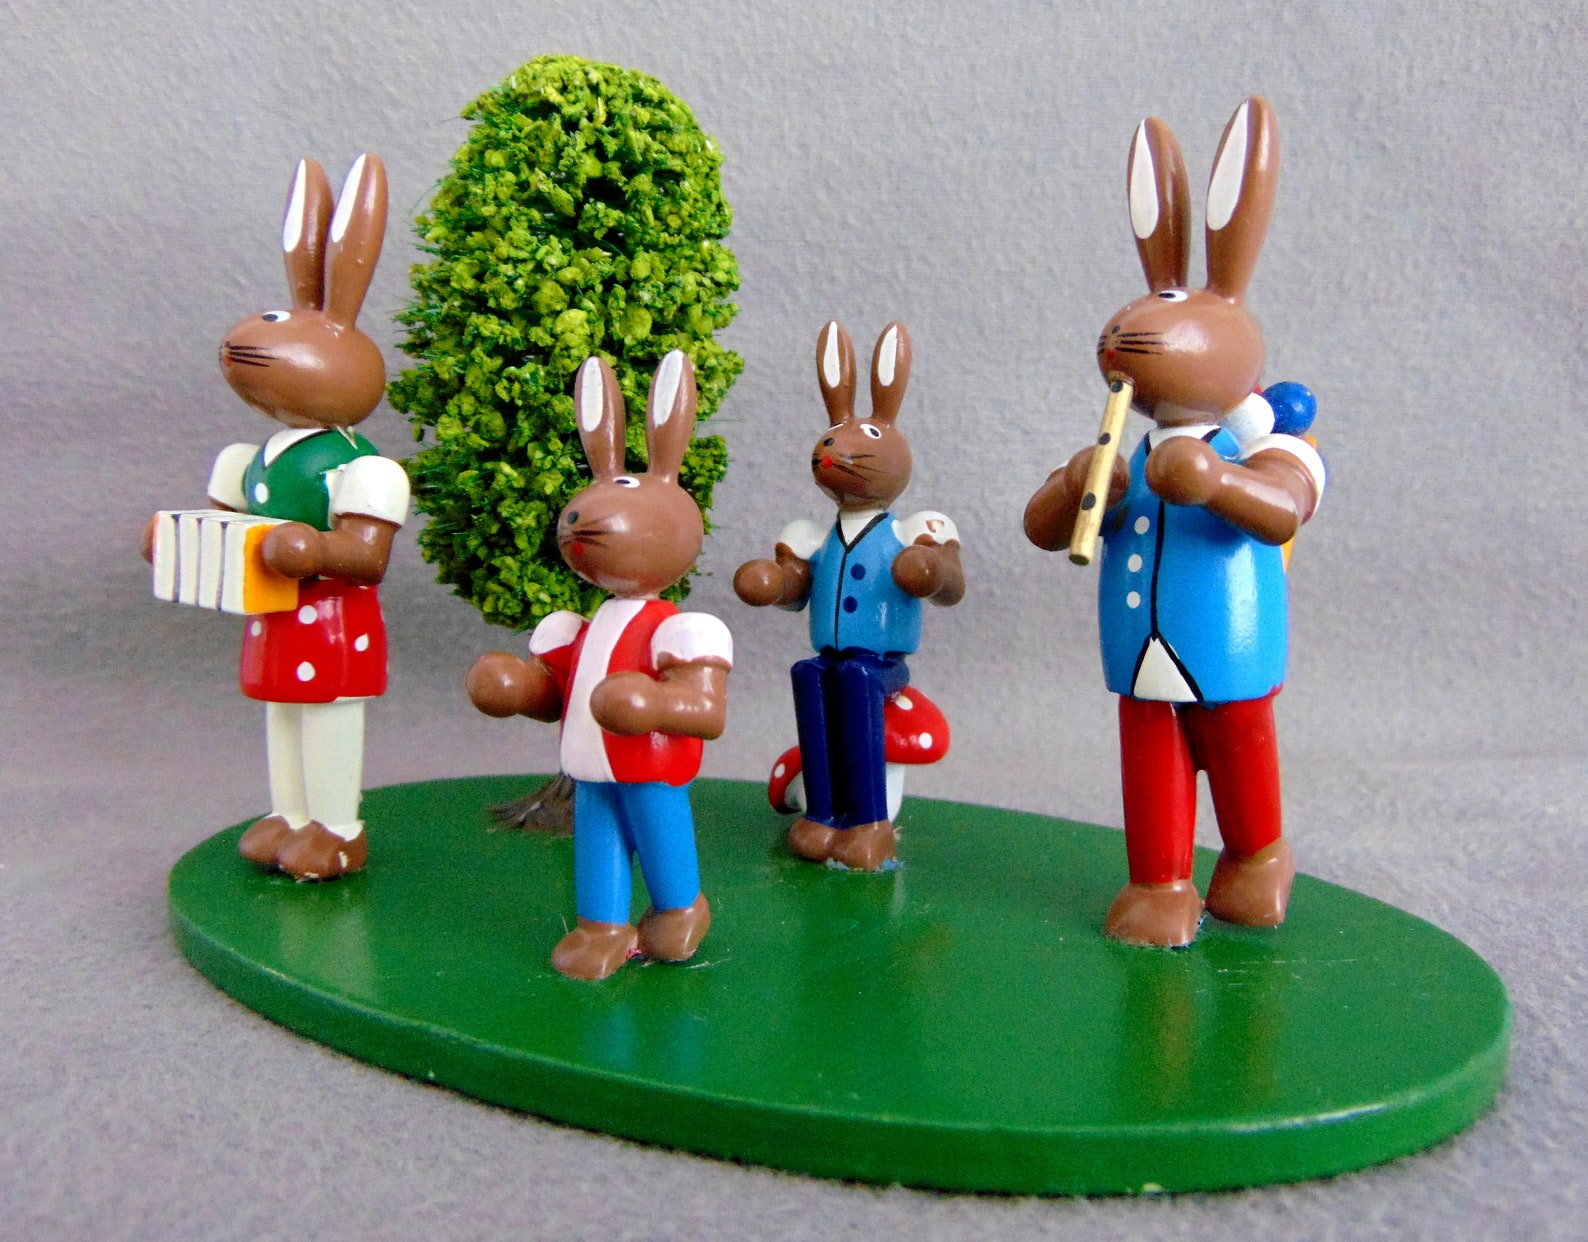 Vintage German Erzgebirge Easter Display Ornament Bunny Family